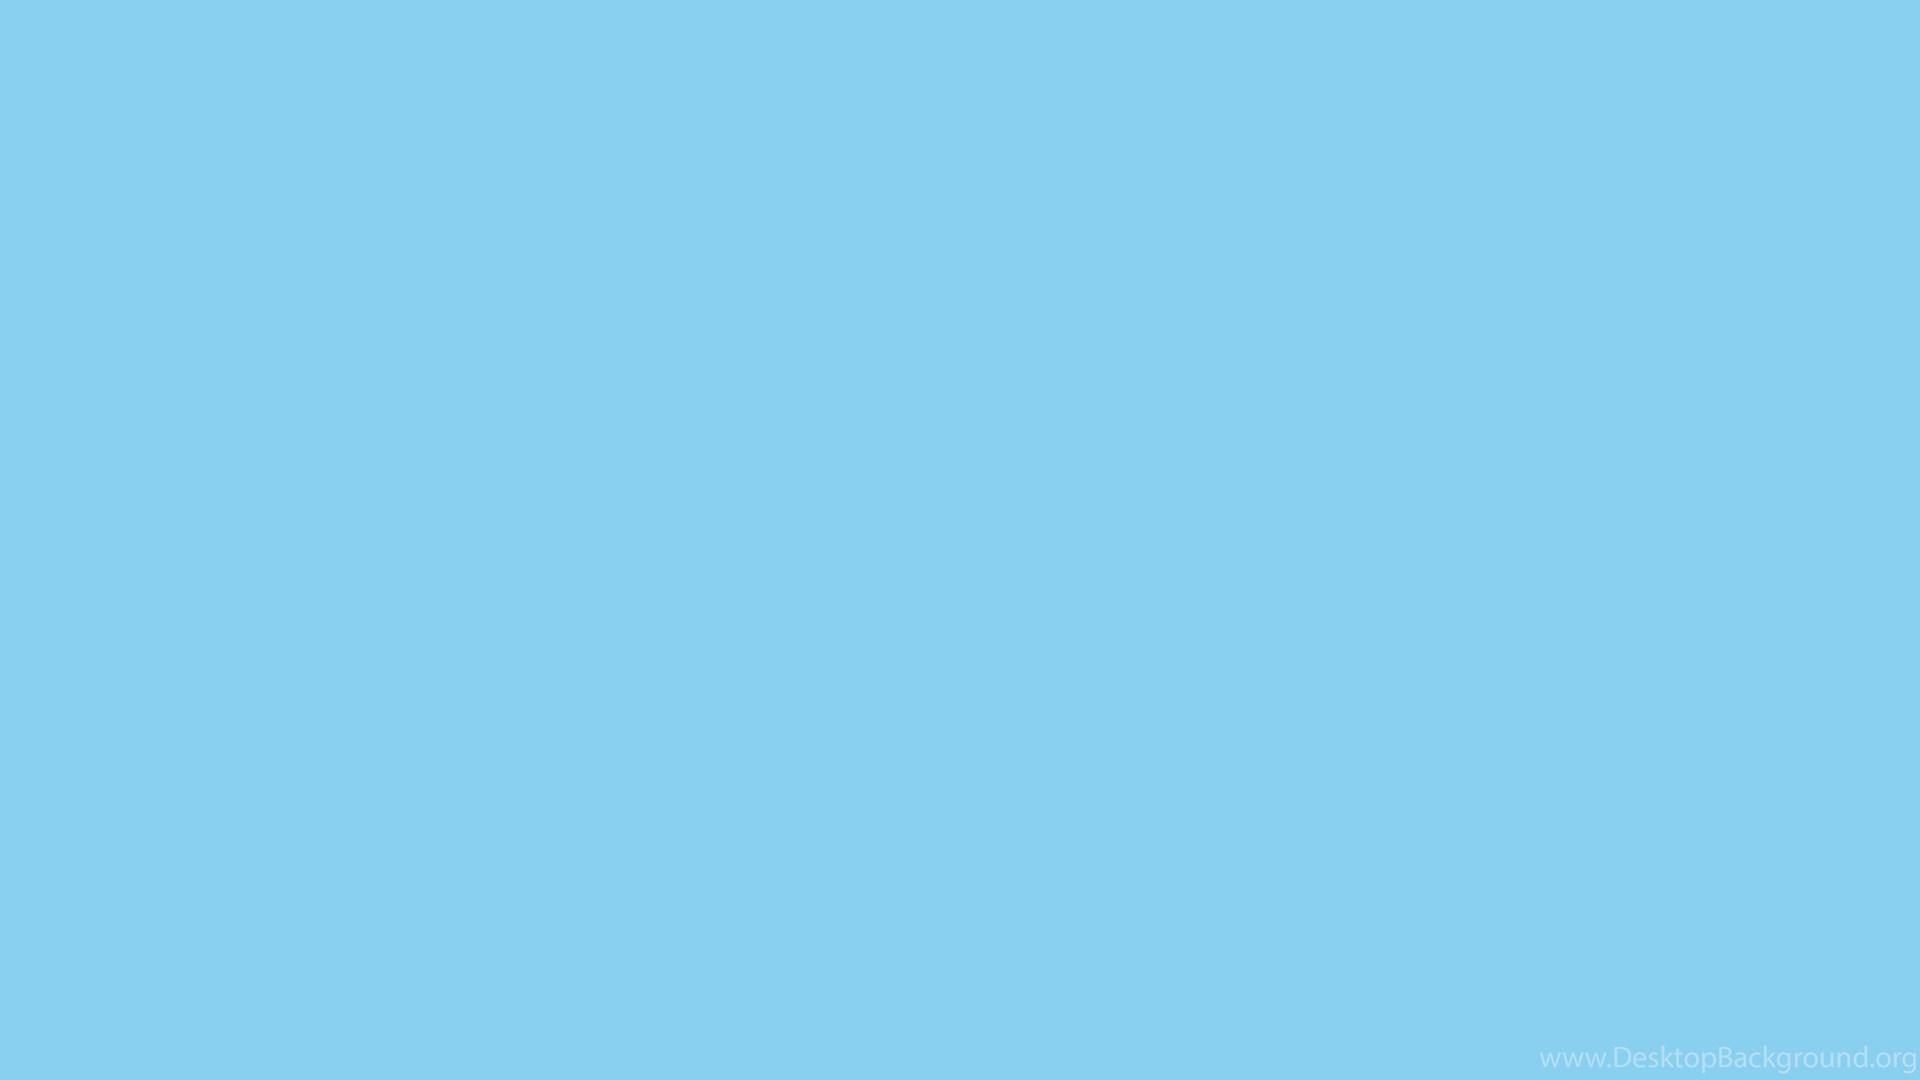 Dual Screen Wallpaper Hd 1920x1080 2560x1440 Baby Blue Solid Color Background Jpg Desktop